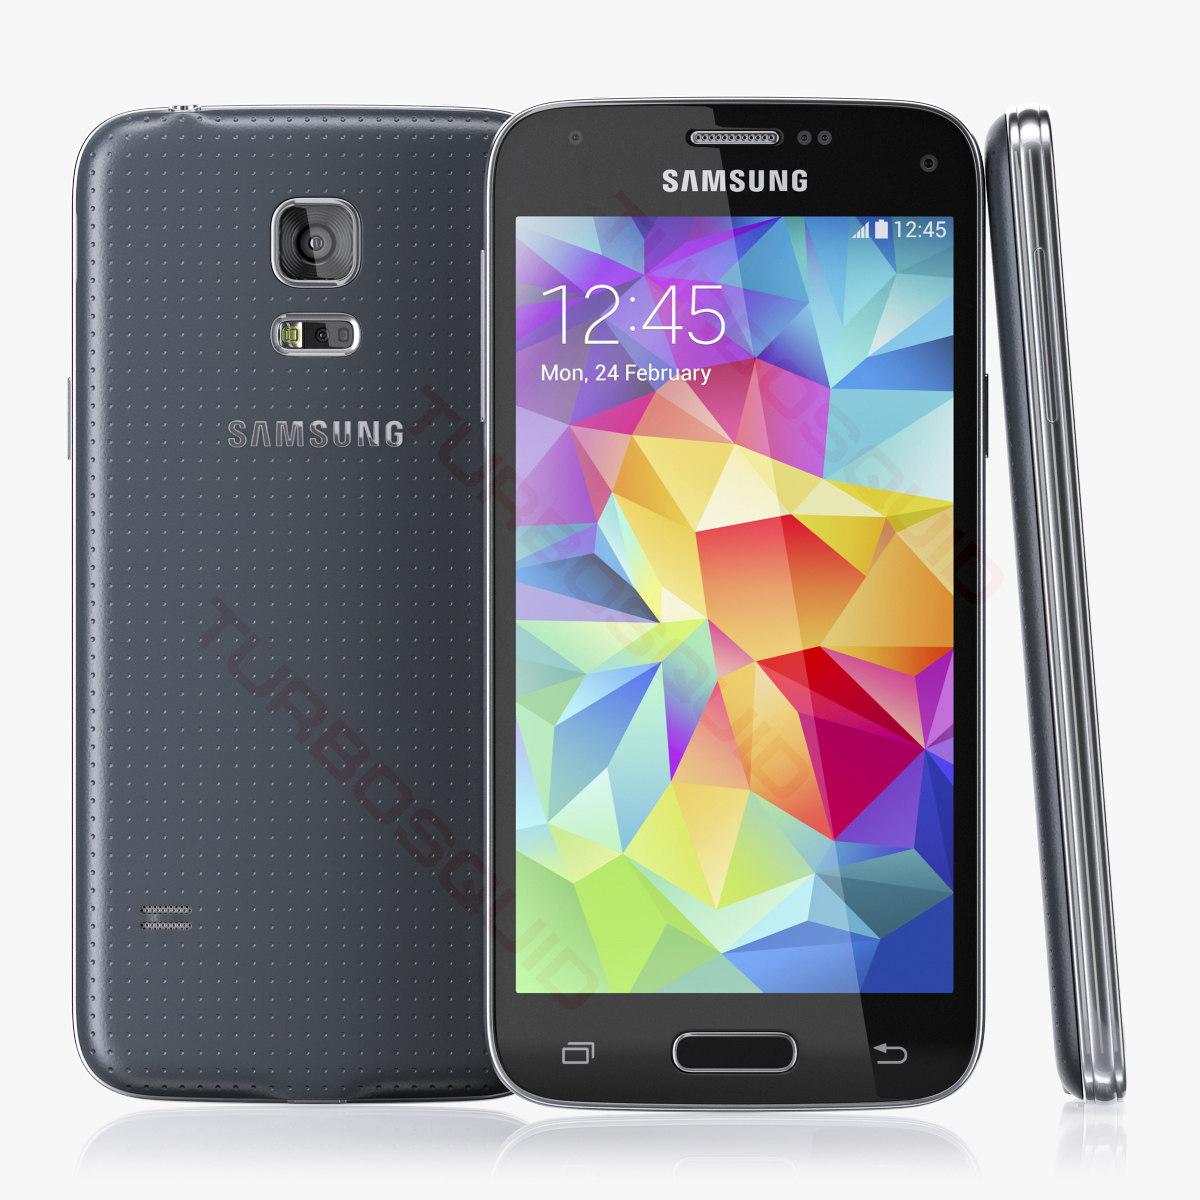 galaxy_s5_mini_00.jpg